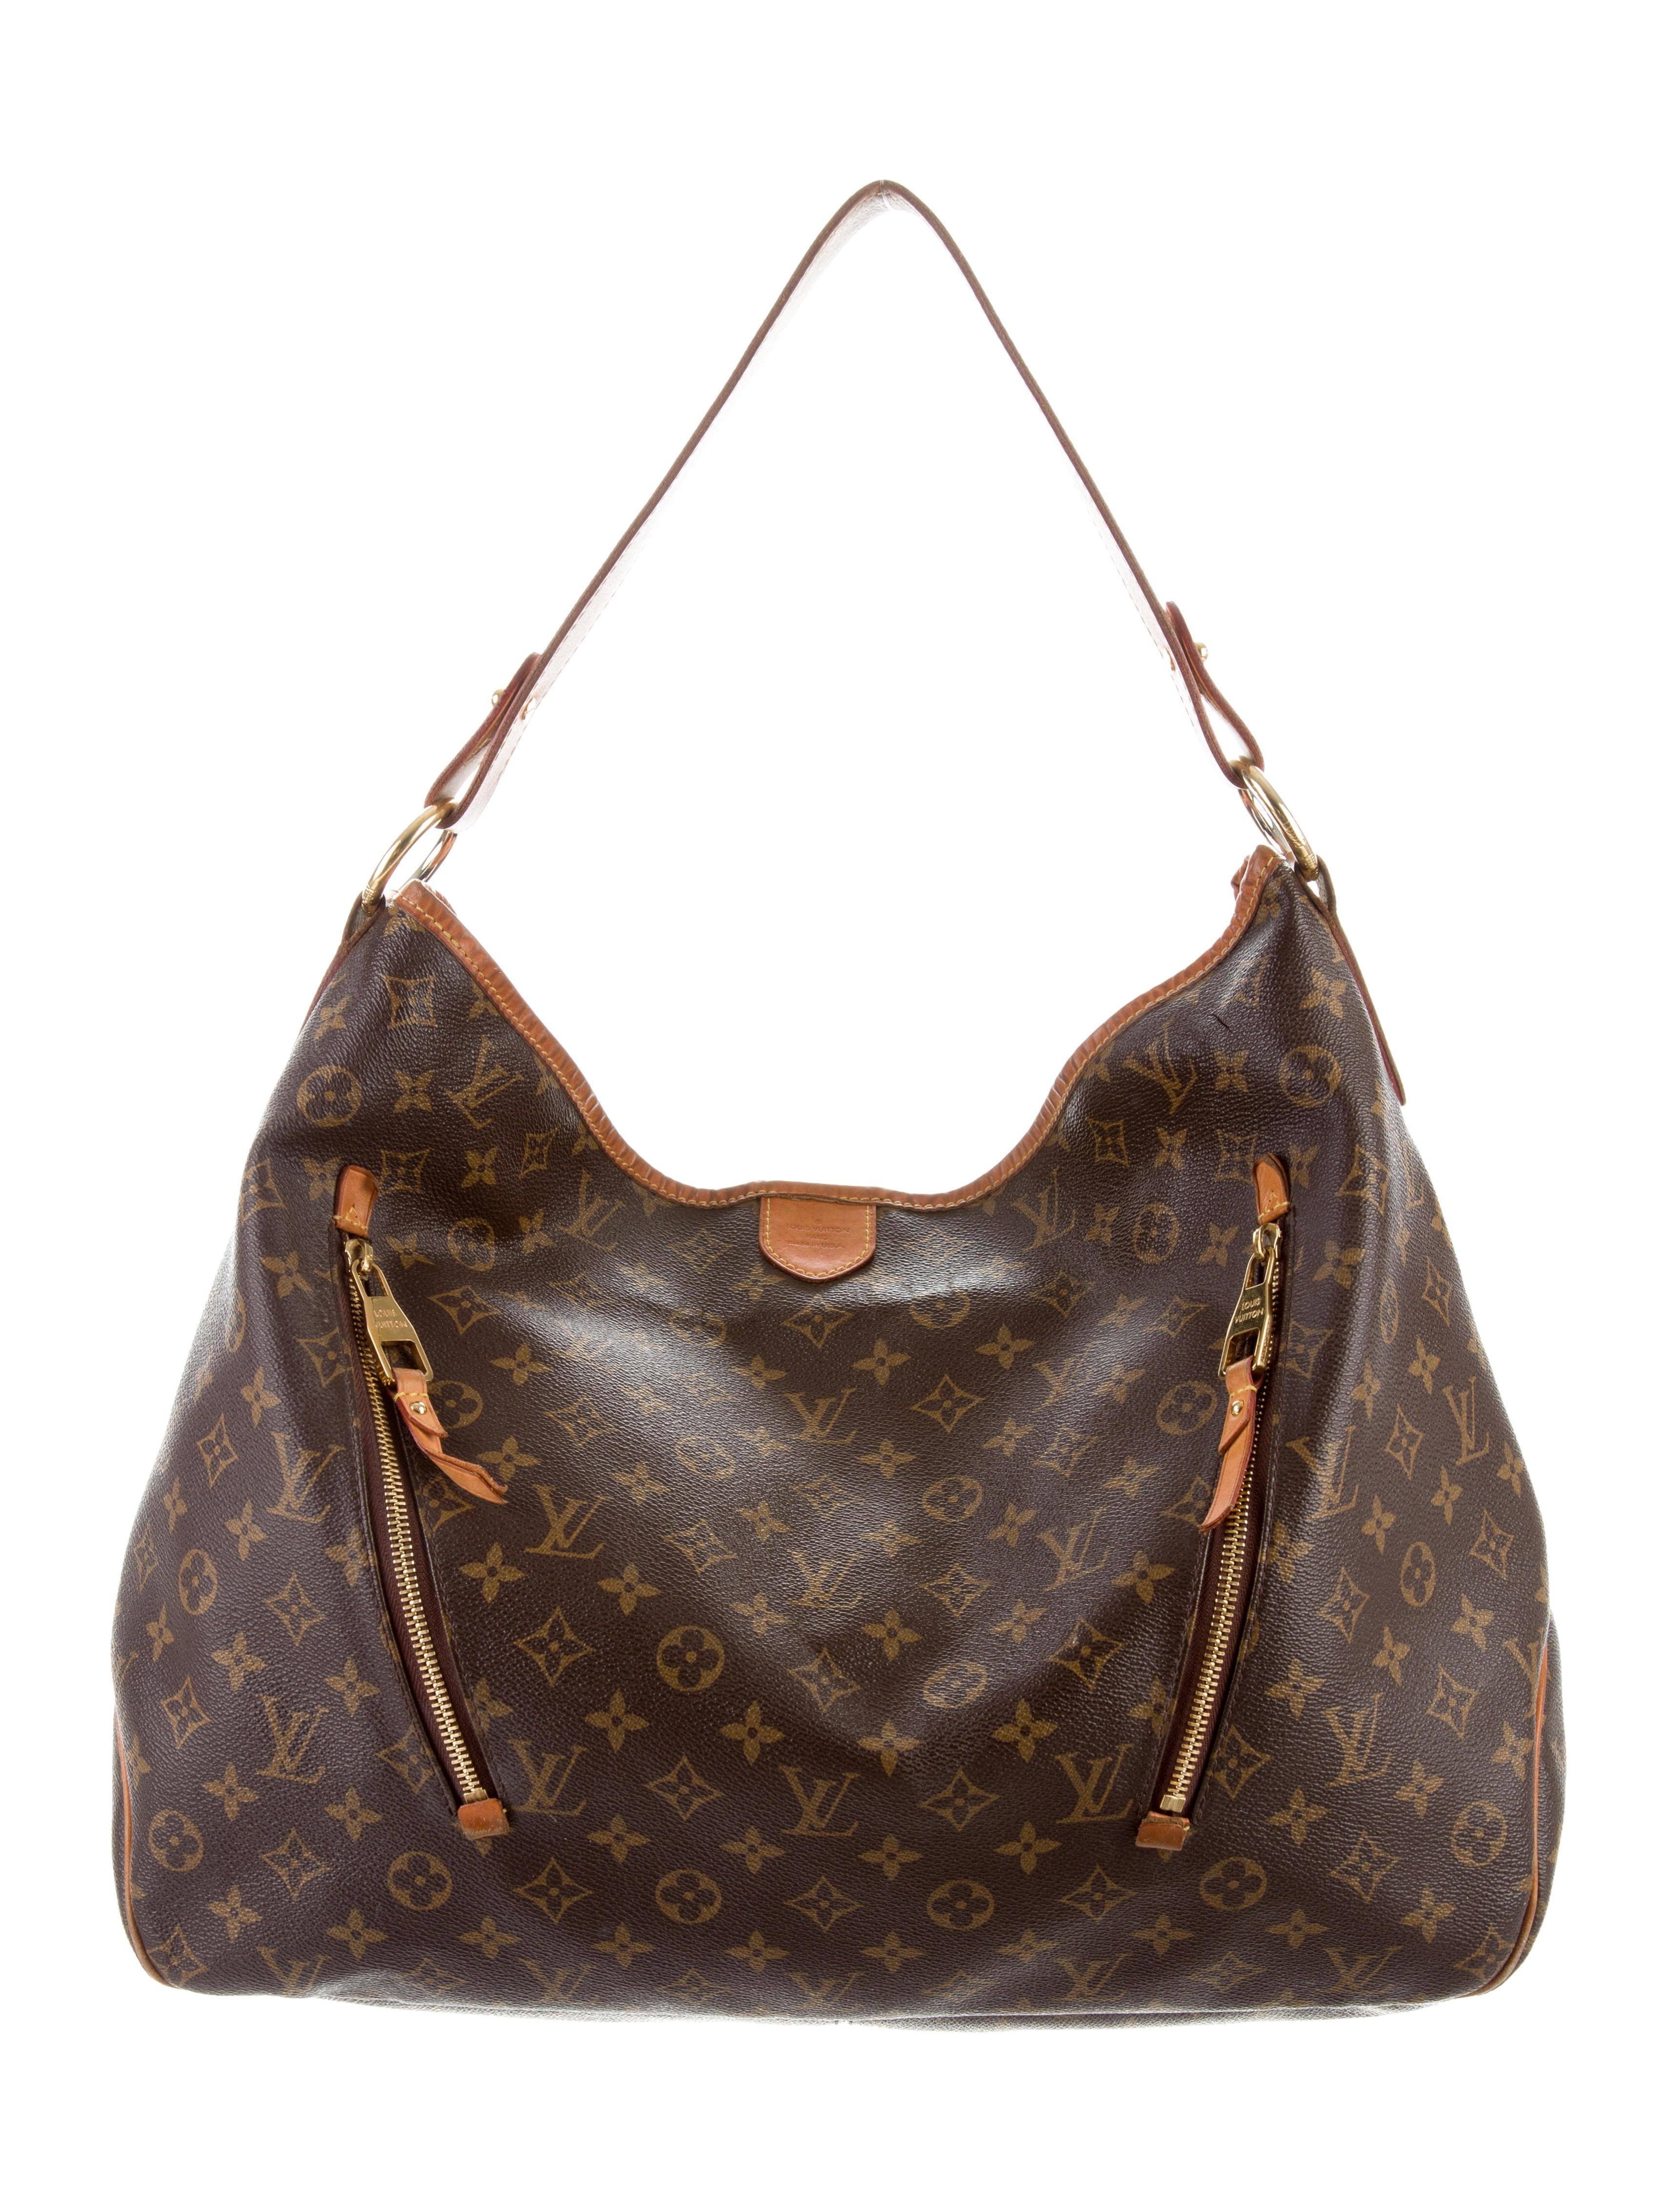 db89956cfc7 Louis Vuitton Monogram Delightful GM - Handbags - LOU182463